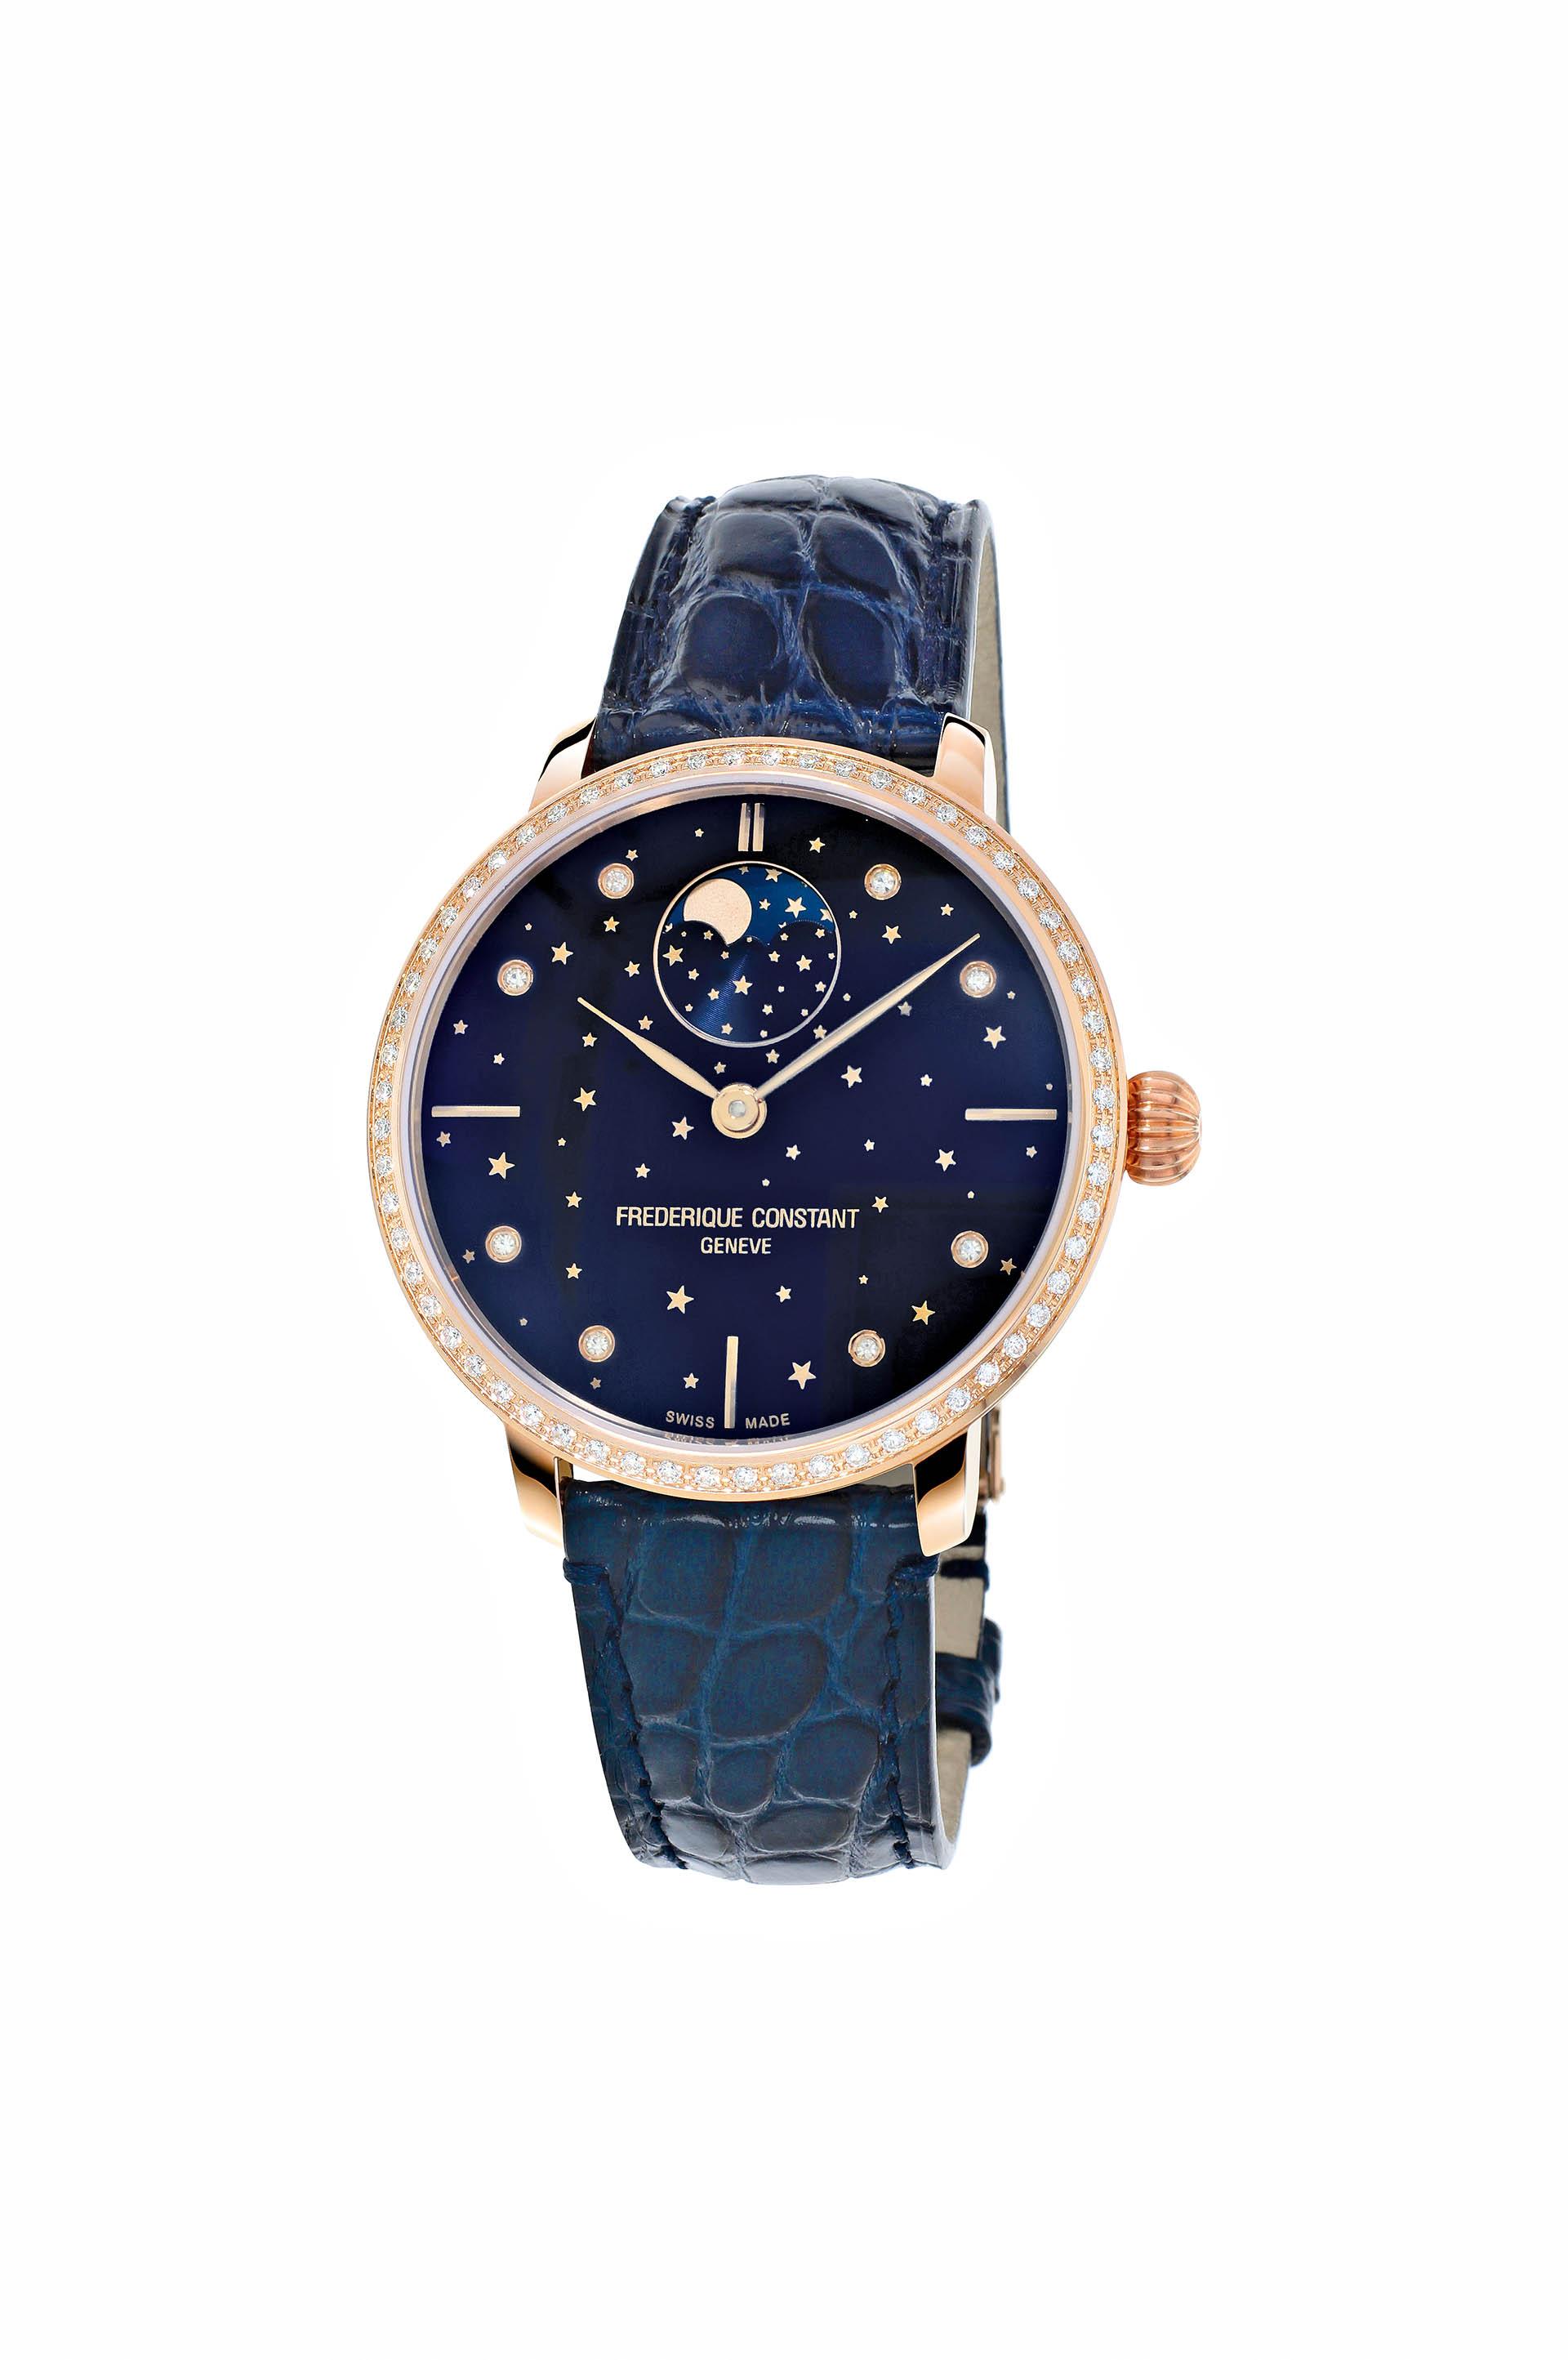 Damenuhr Slimline Moonphase Stars Manufacture von Frédérique Constant.